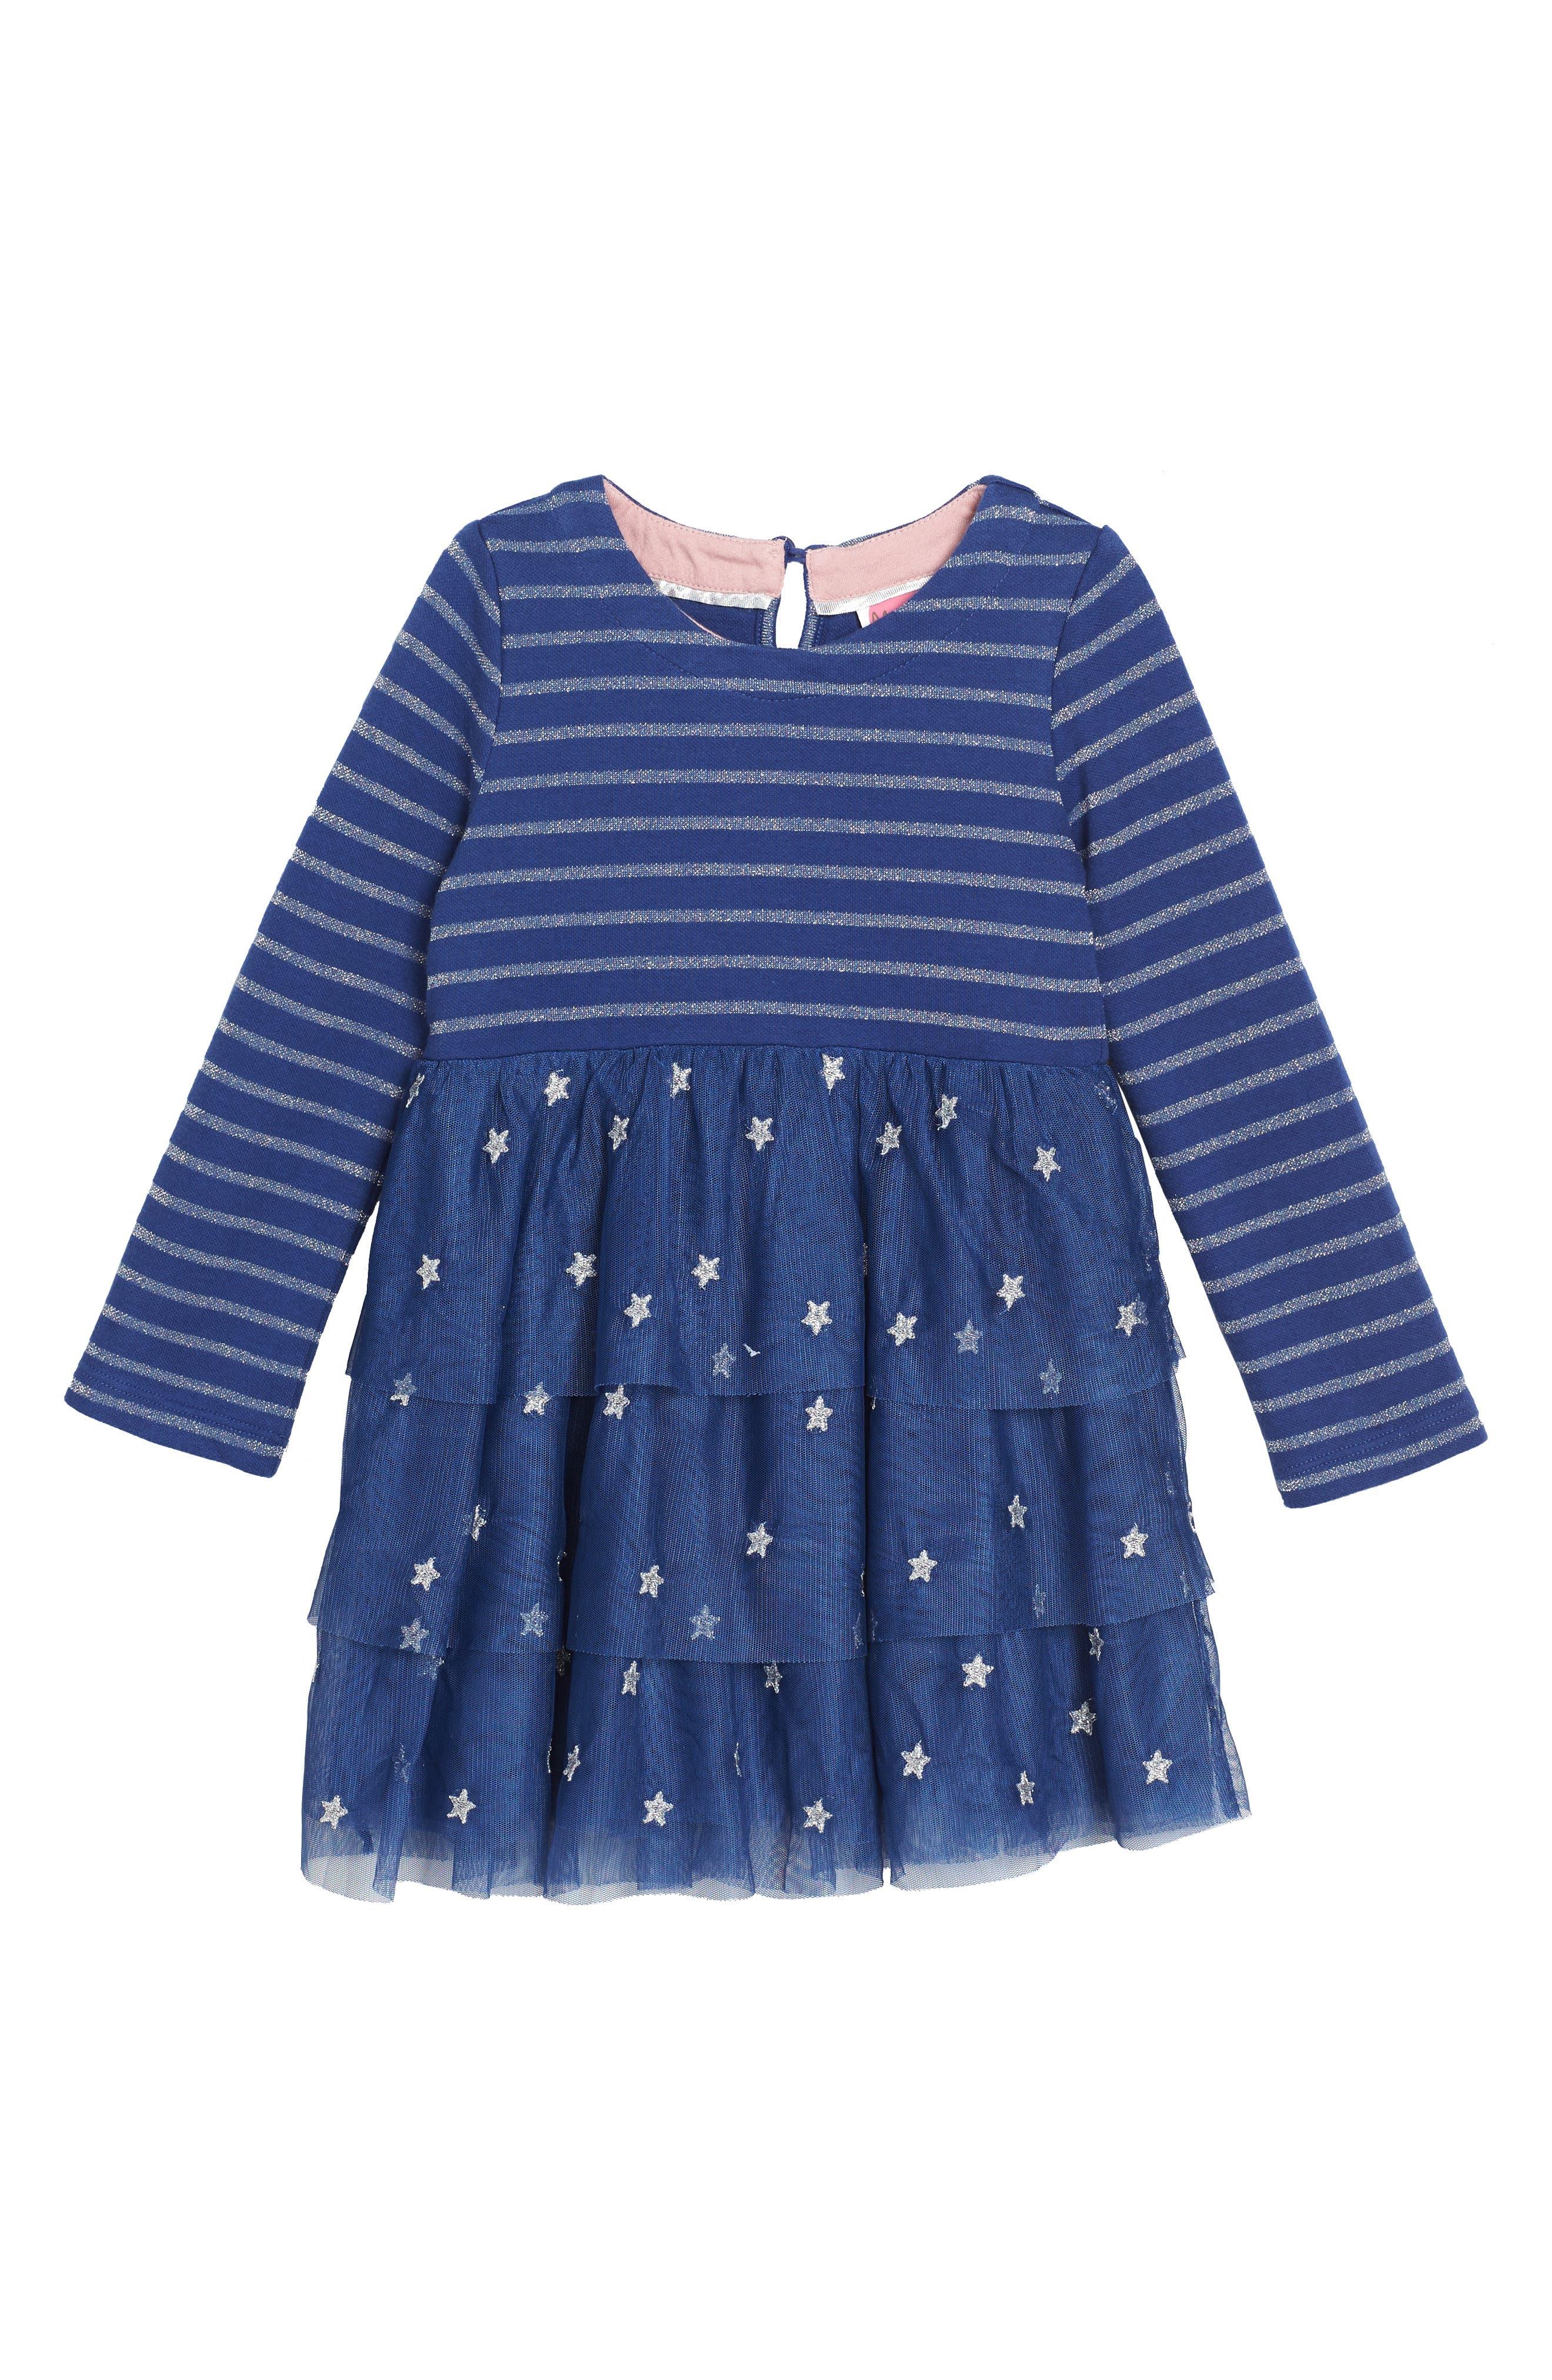 Blue dress size 6x insulated